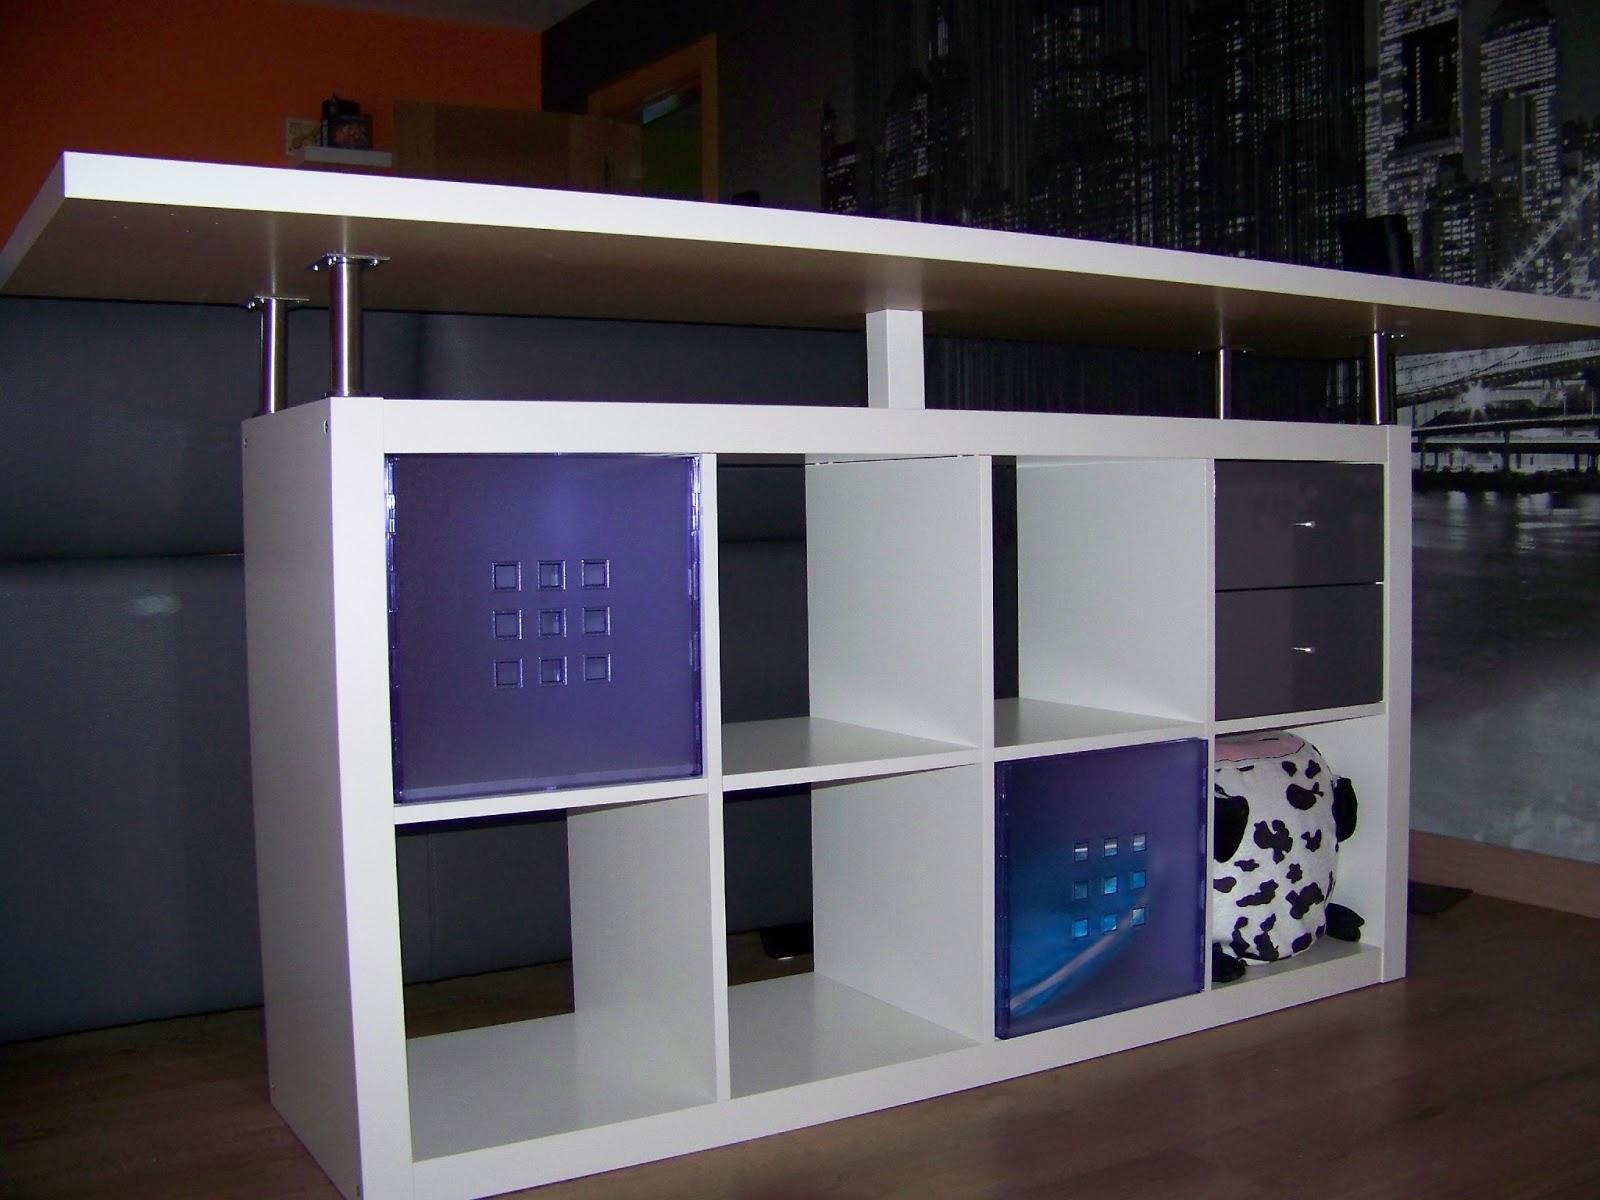 dormitorio muebles modernos barra cocina ikea. Black Bedroom Furniture Sets. Home Design Ideas